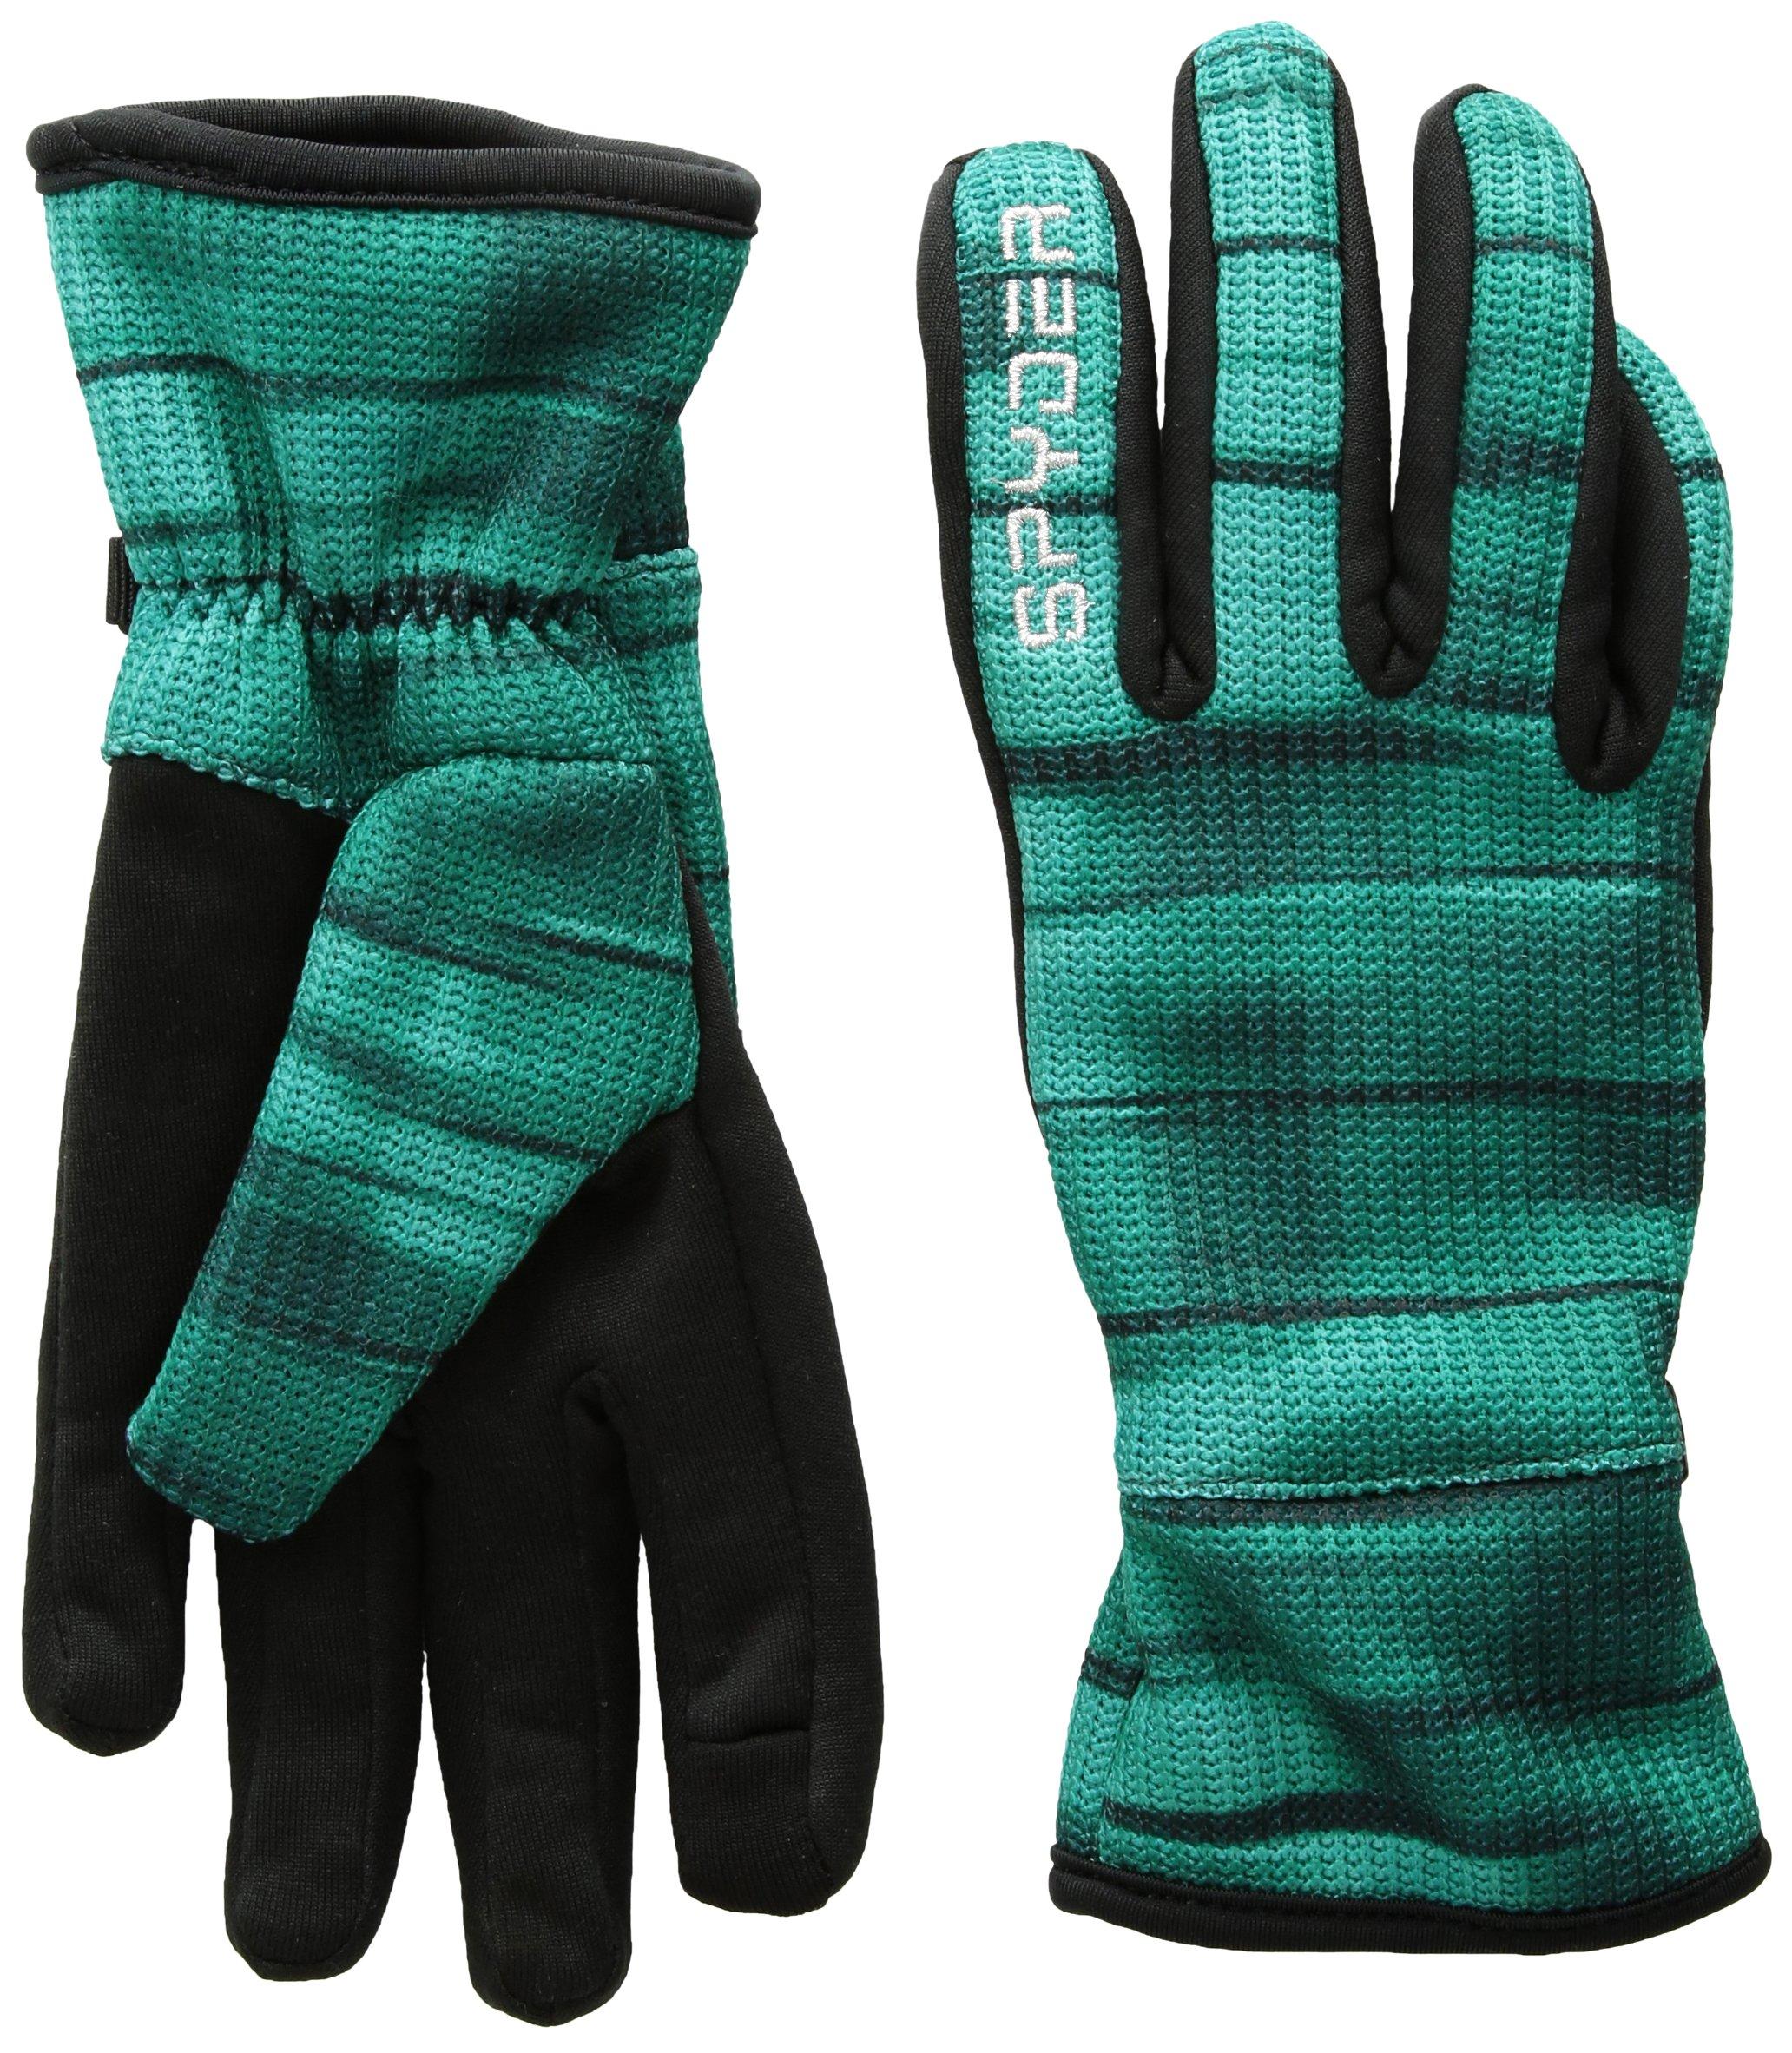 Spyder Women's Stryke Fleece Conduct Glove, Baltic Wind Print, X-Small by Spyder